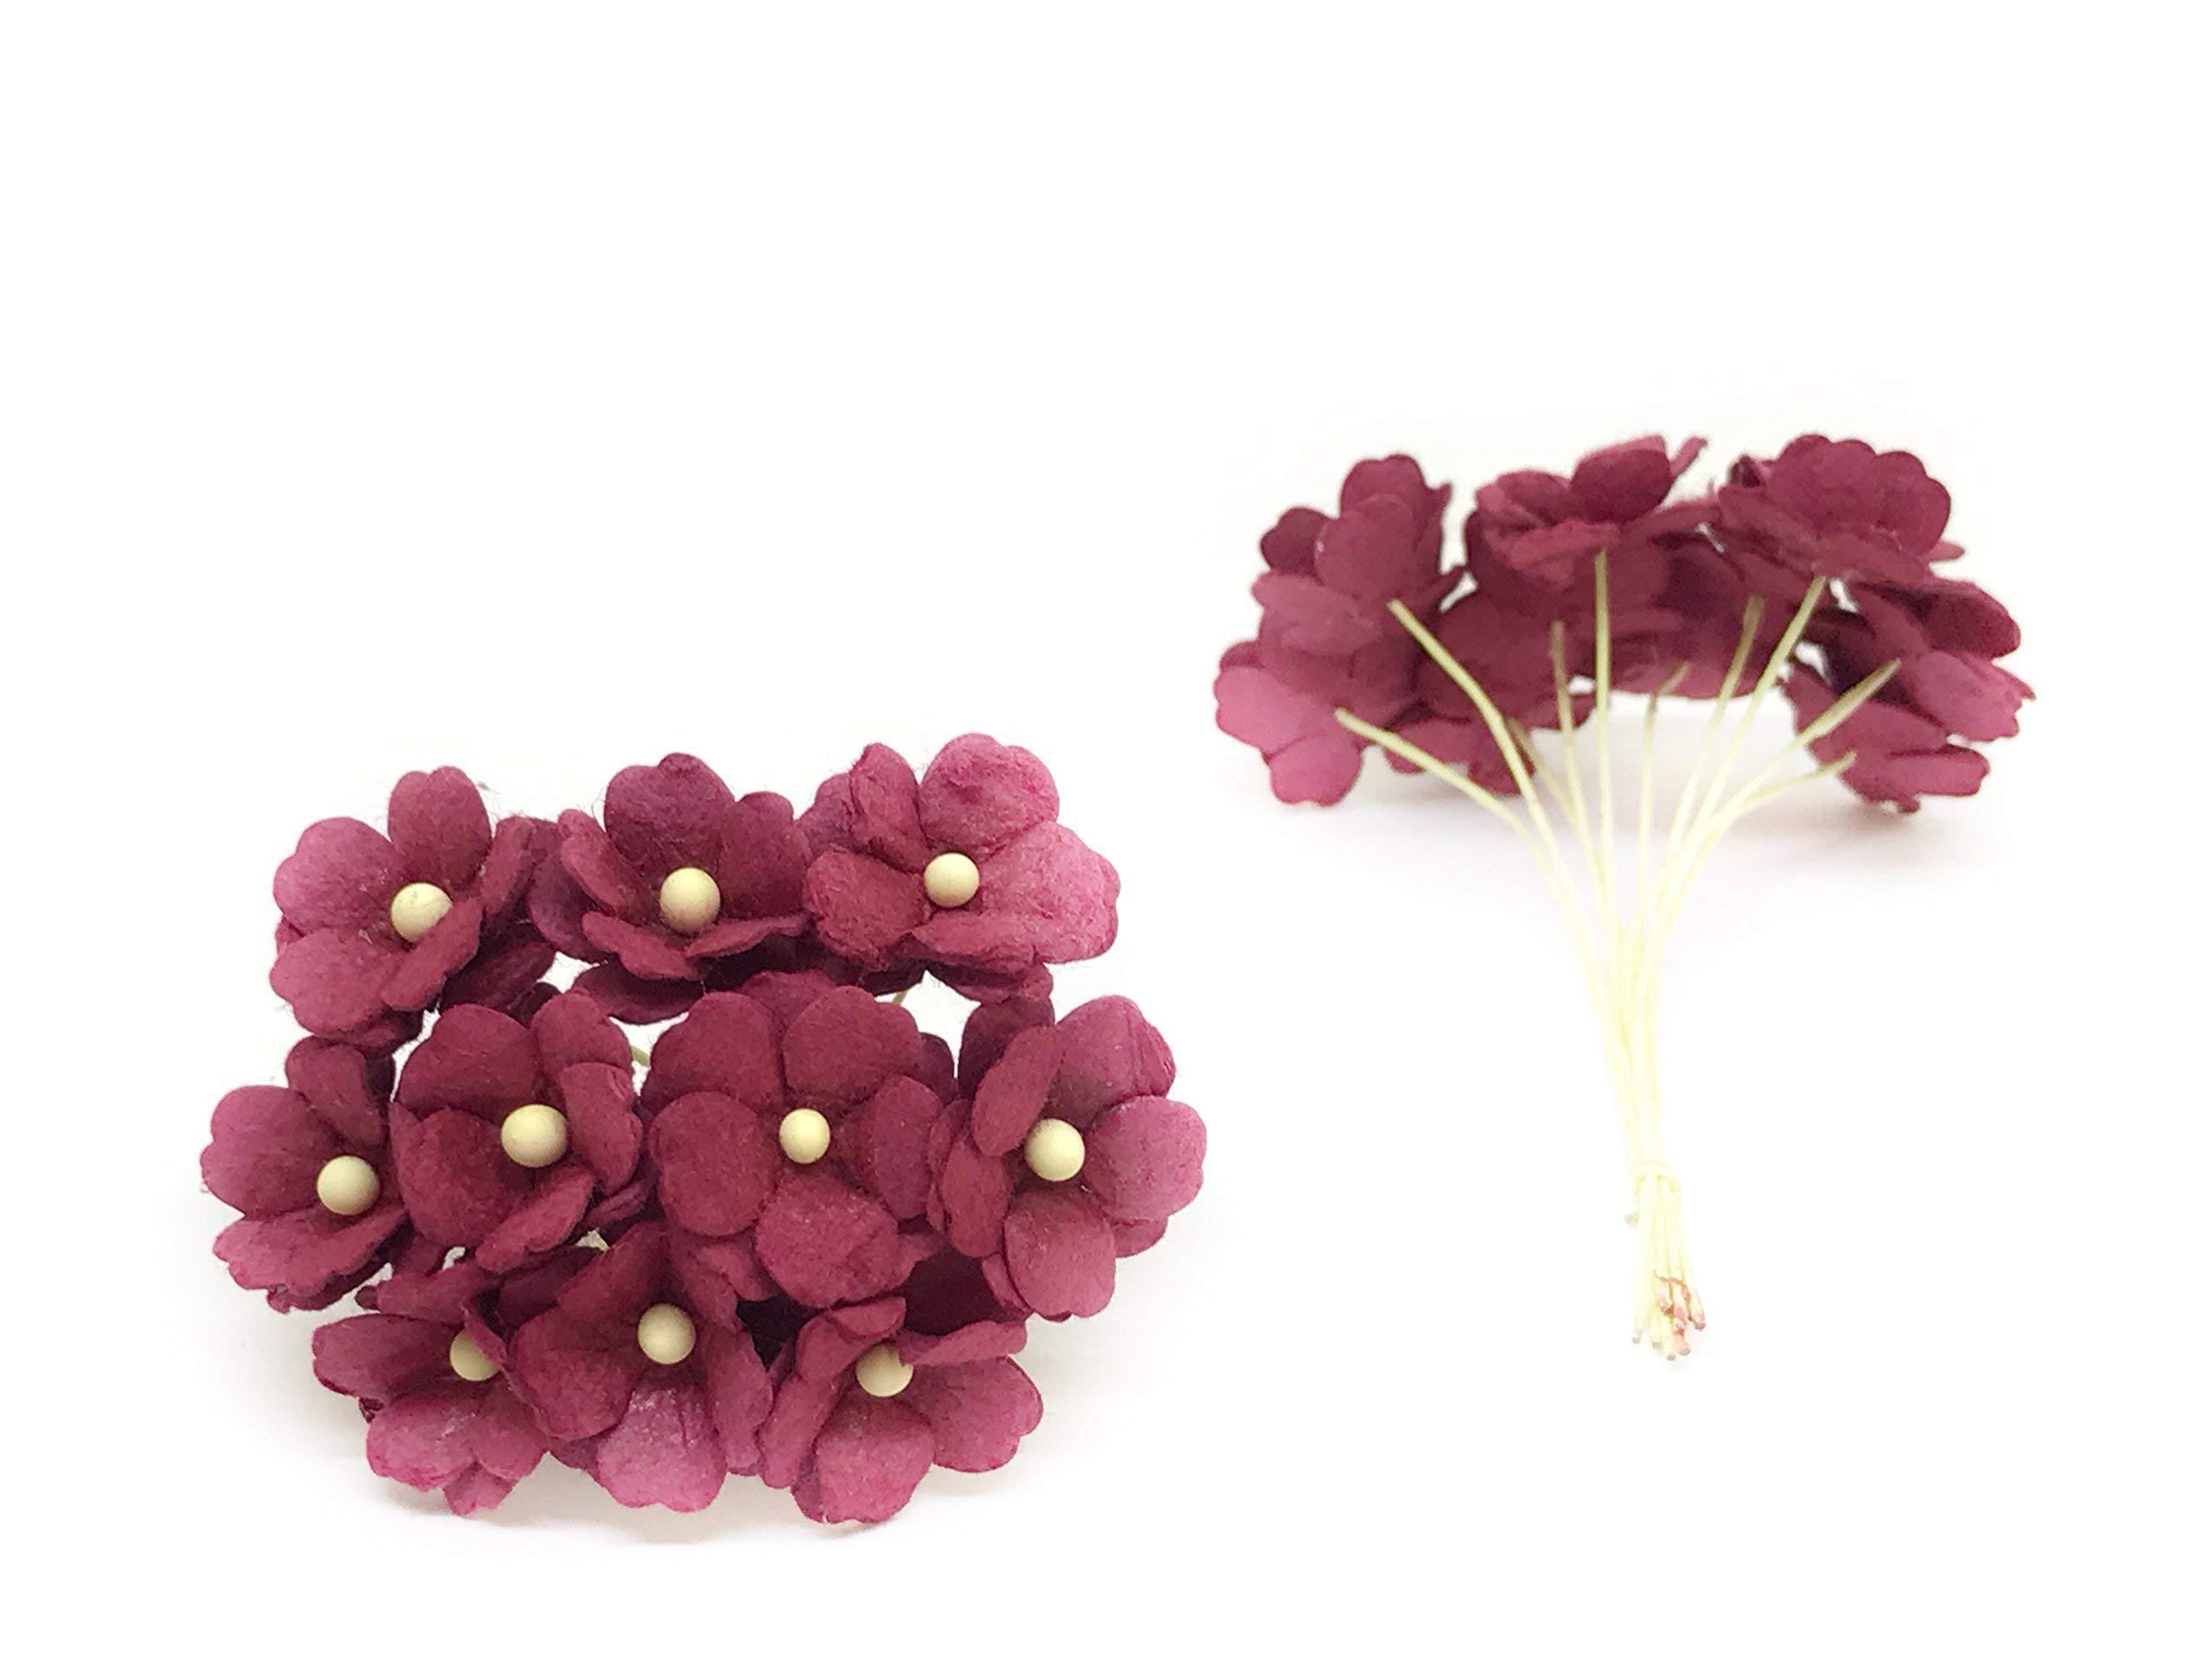 15cm-Maroon-Mulberry-Paper-Flowers-Maroon-Paper-Hydrangea-Wedding-Flowers-Wedding-Decor-Wedding-Table-Flowers-Maroon-Wedding-Artificial-Flowers-50-Pieces